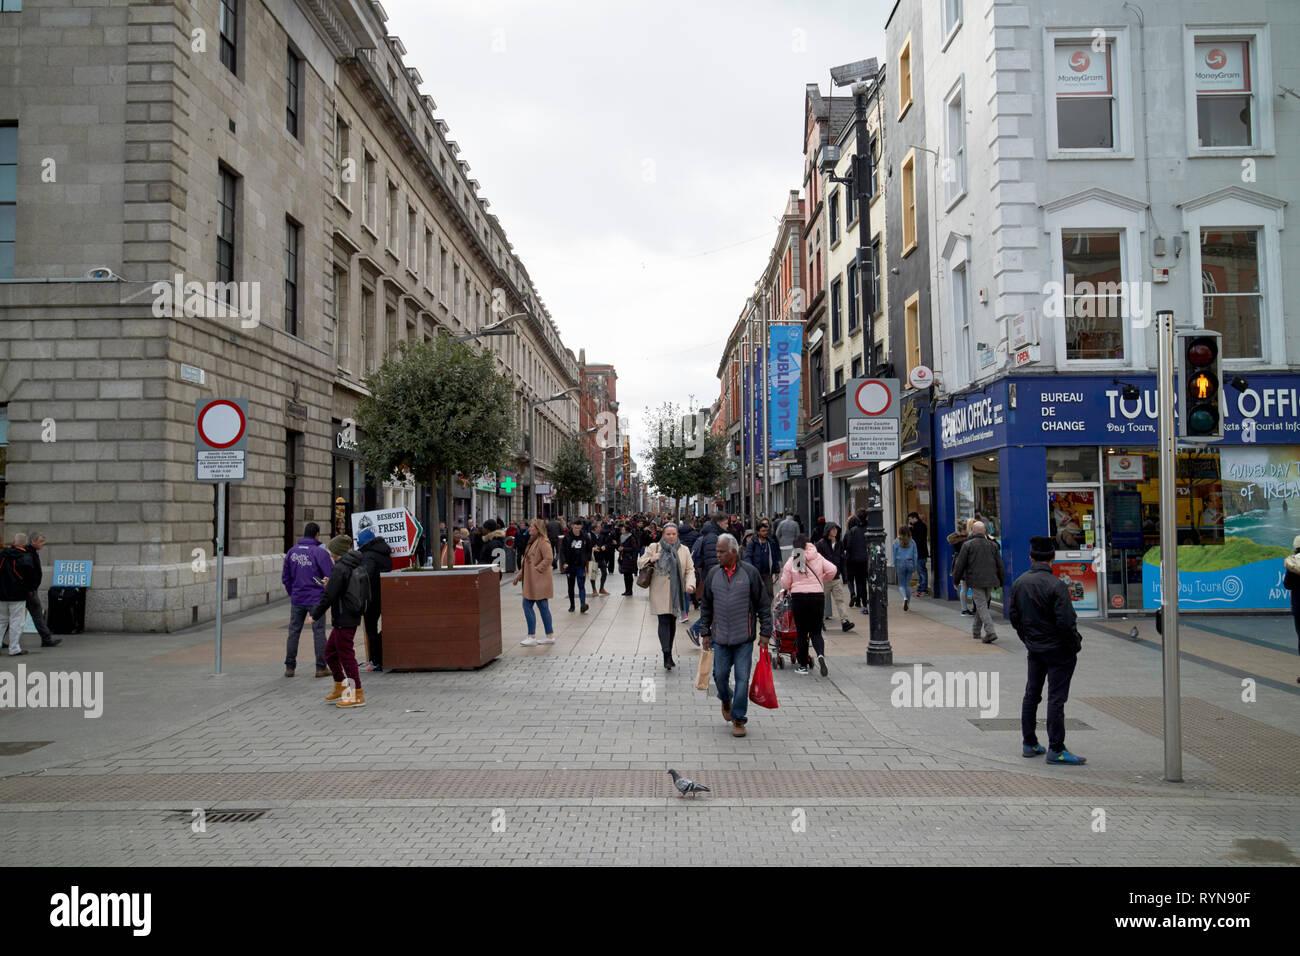 Looking along Henry street from oconnell street Dublin Republic of Ireland Europe - Stock Image